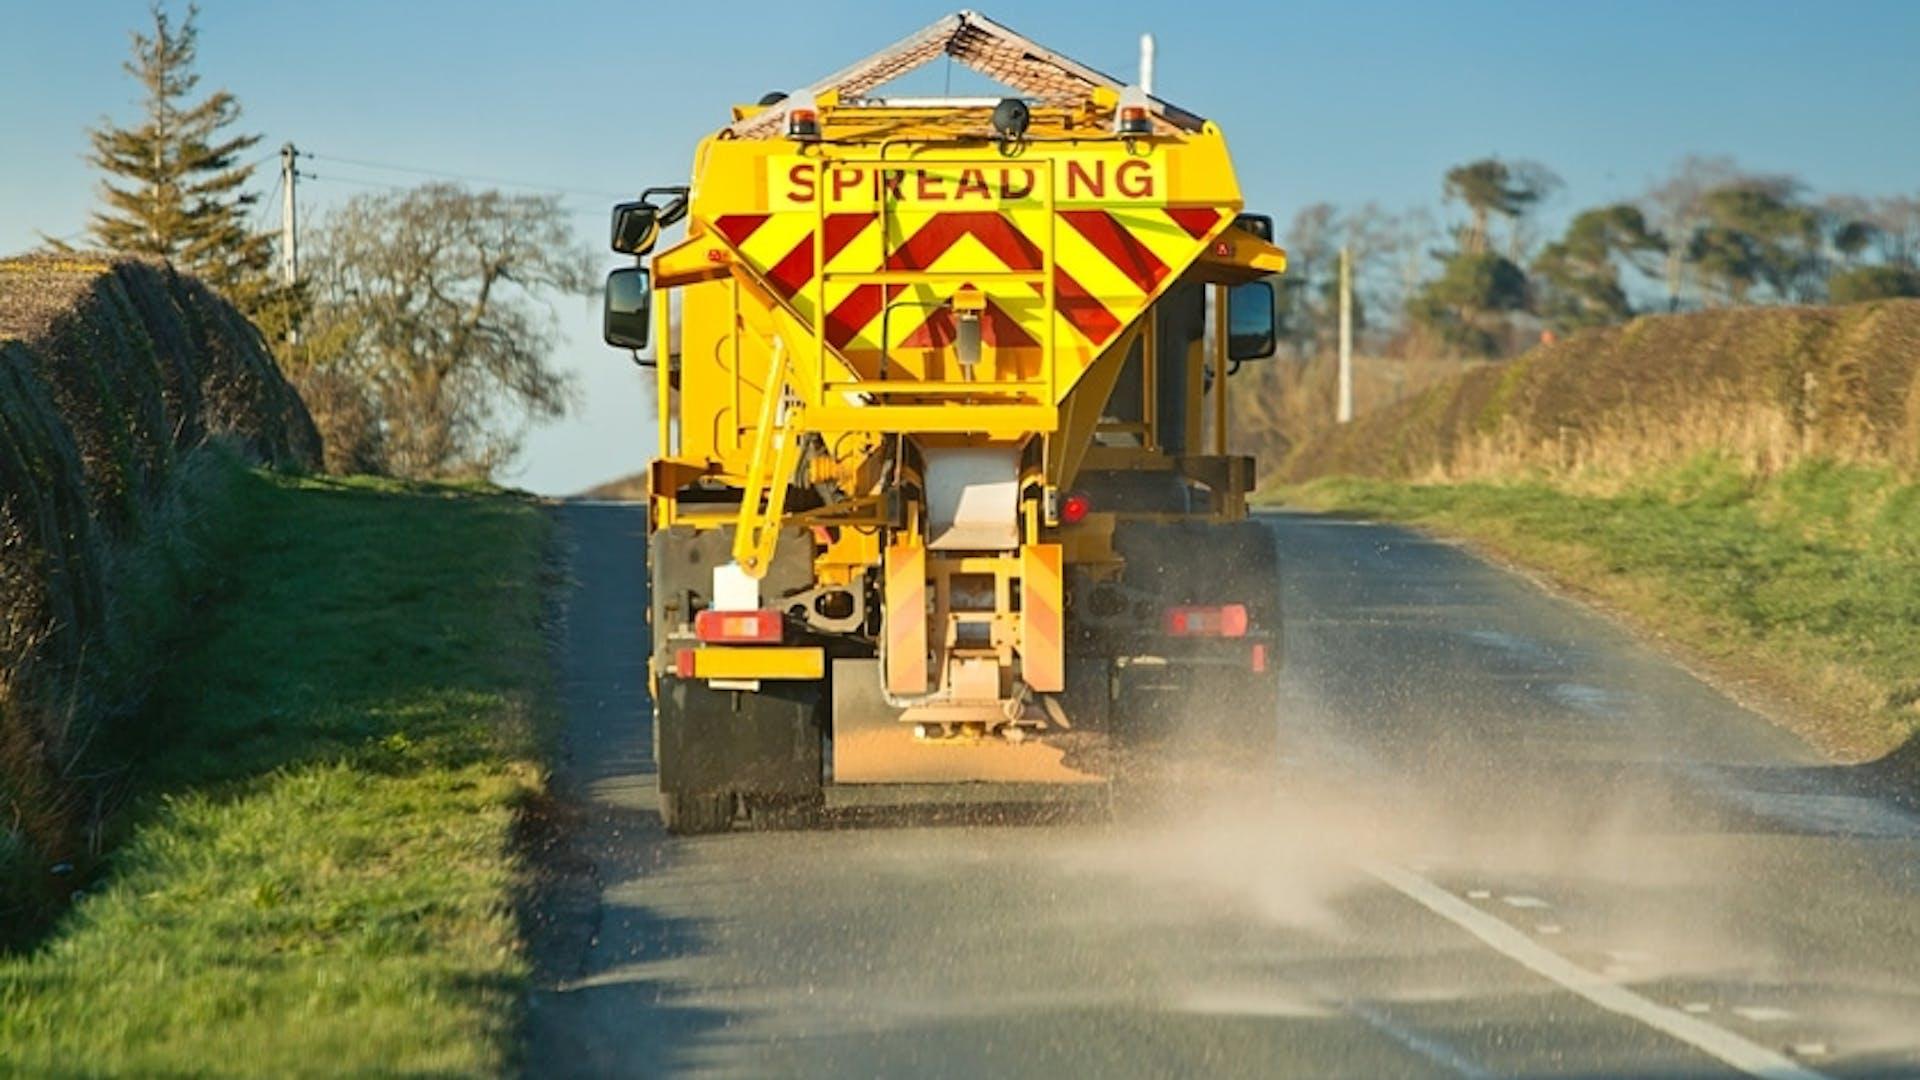 Lorry gritting roads near Gatwick Airport